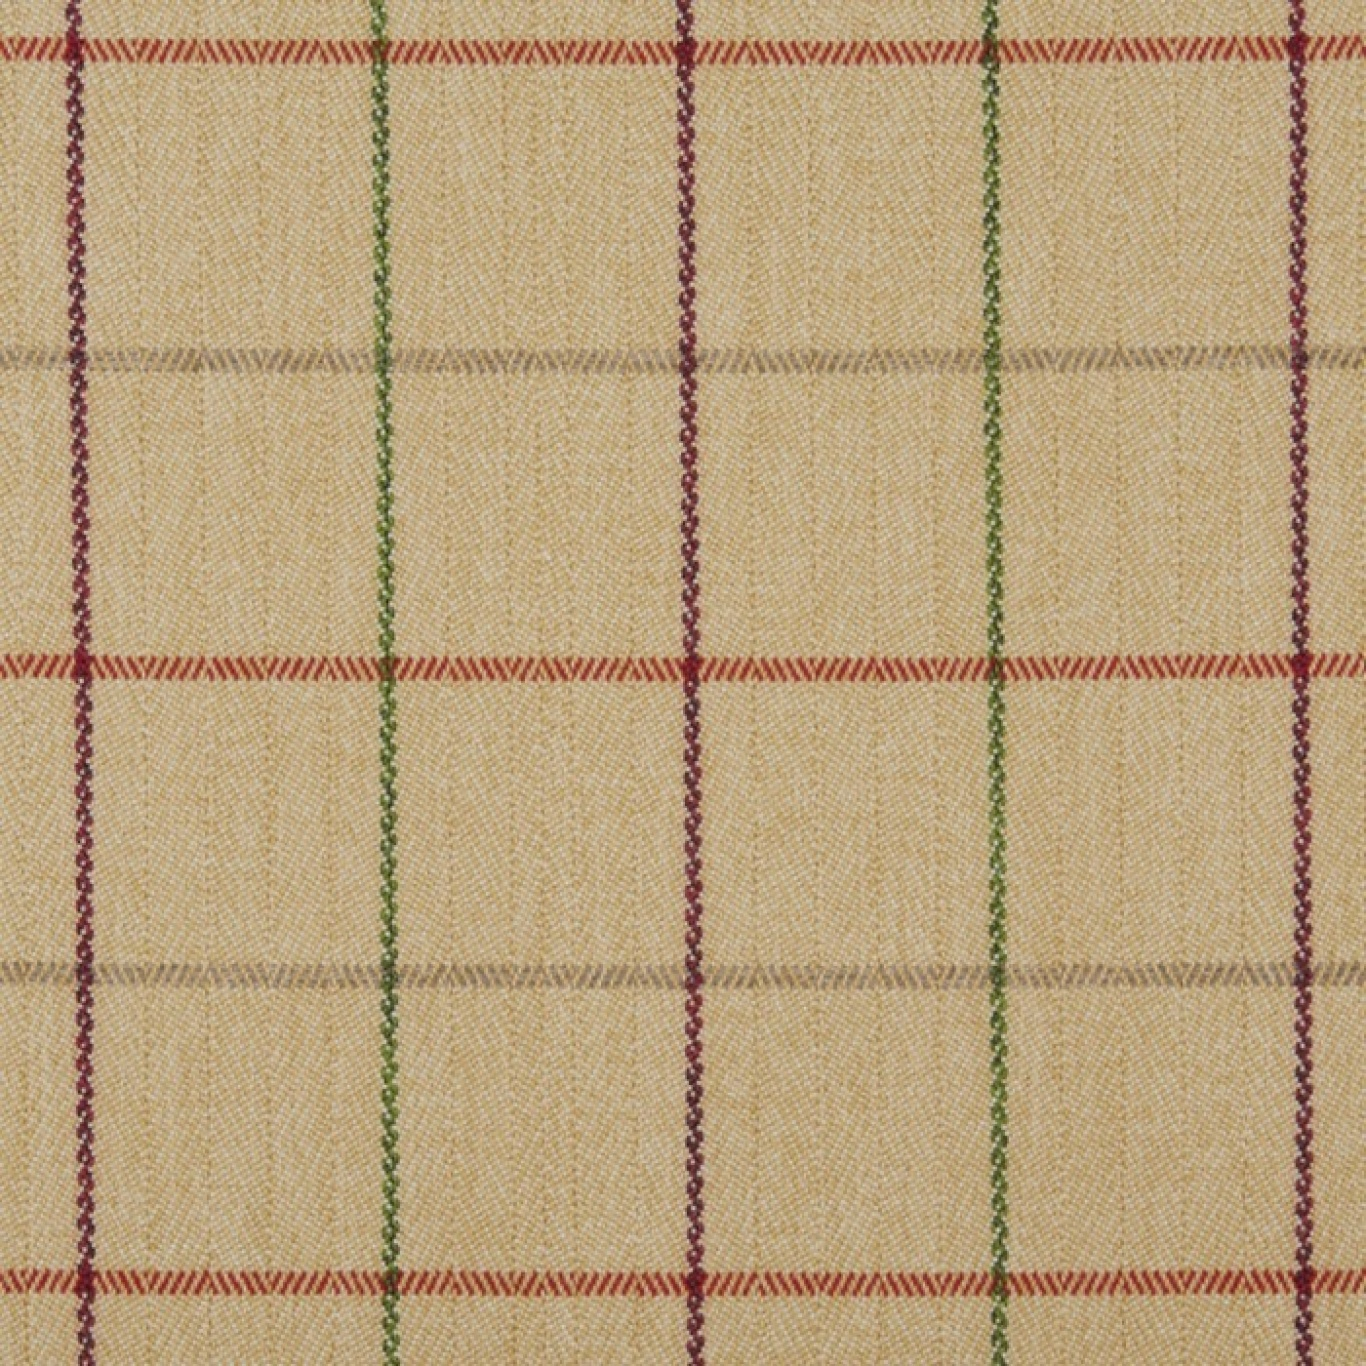 Image of Prestigious Brodie Sand Fabric